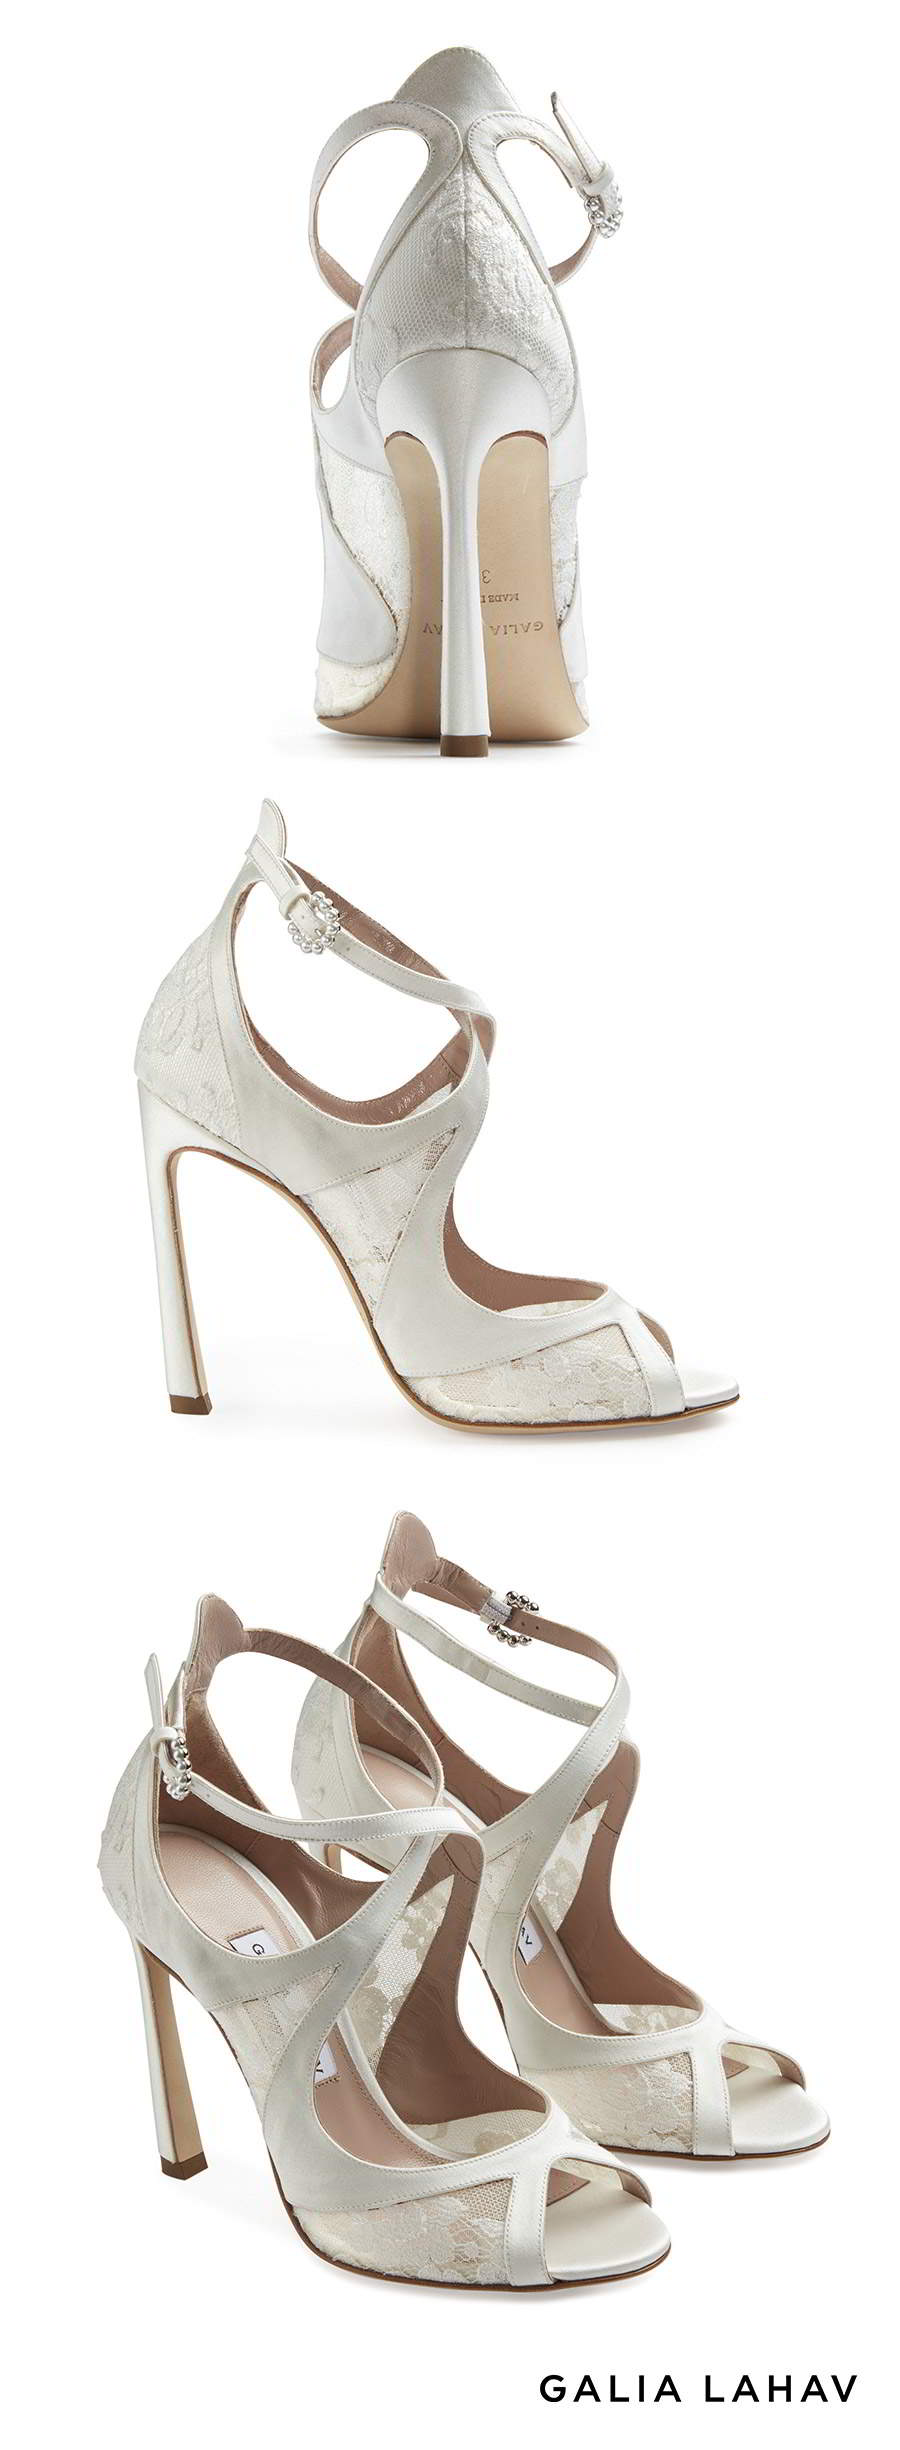 galia lahav shoes fall 2021 bridal lace cross strap open toe high heel wedding shoe packshot (charlotte) mv